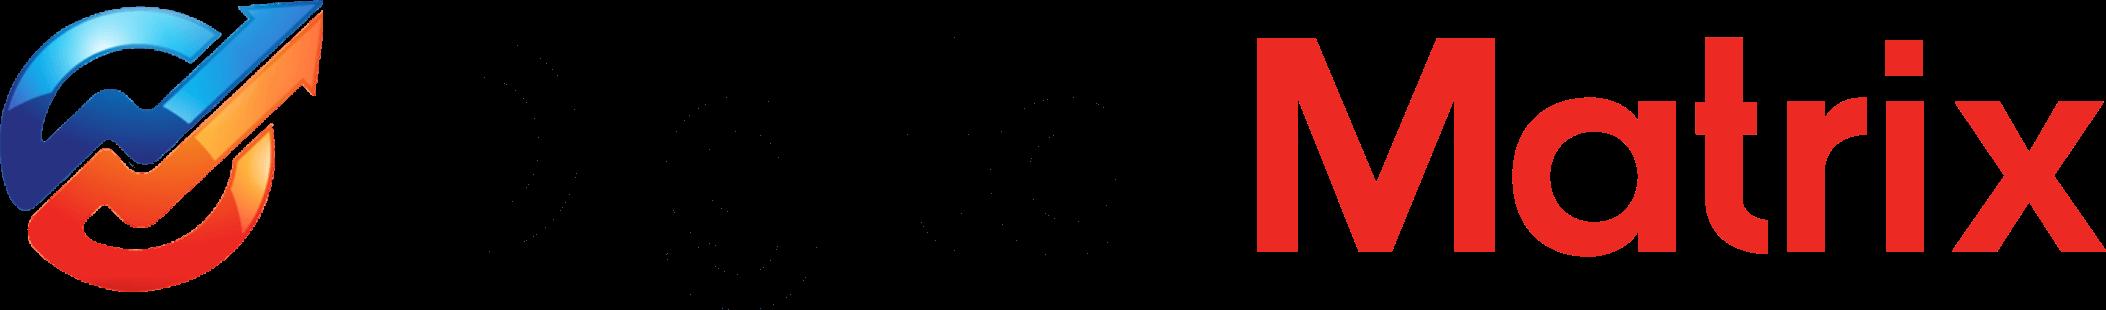 digital matrix agency logo 03